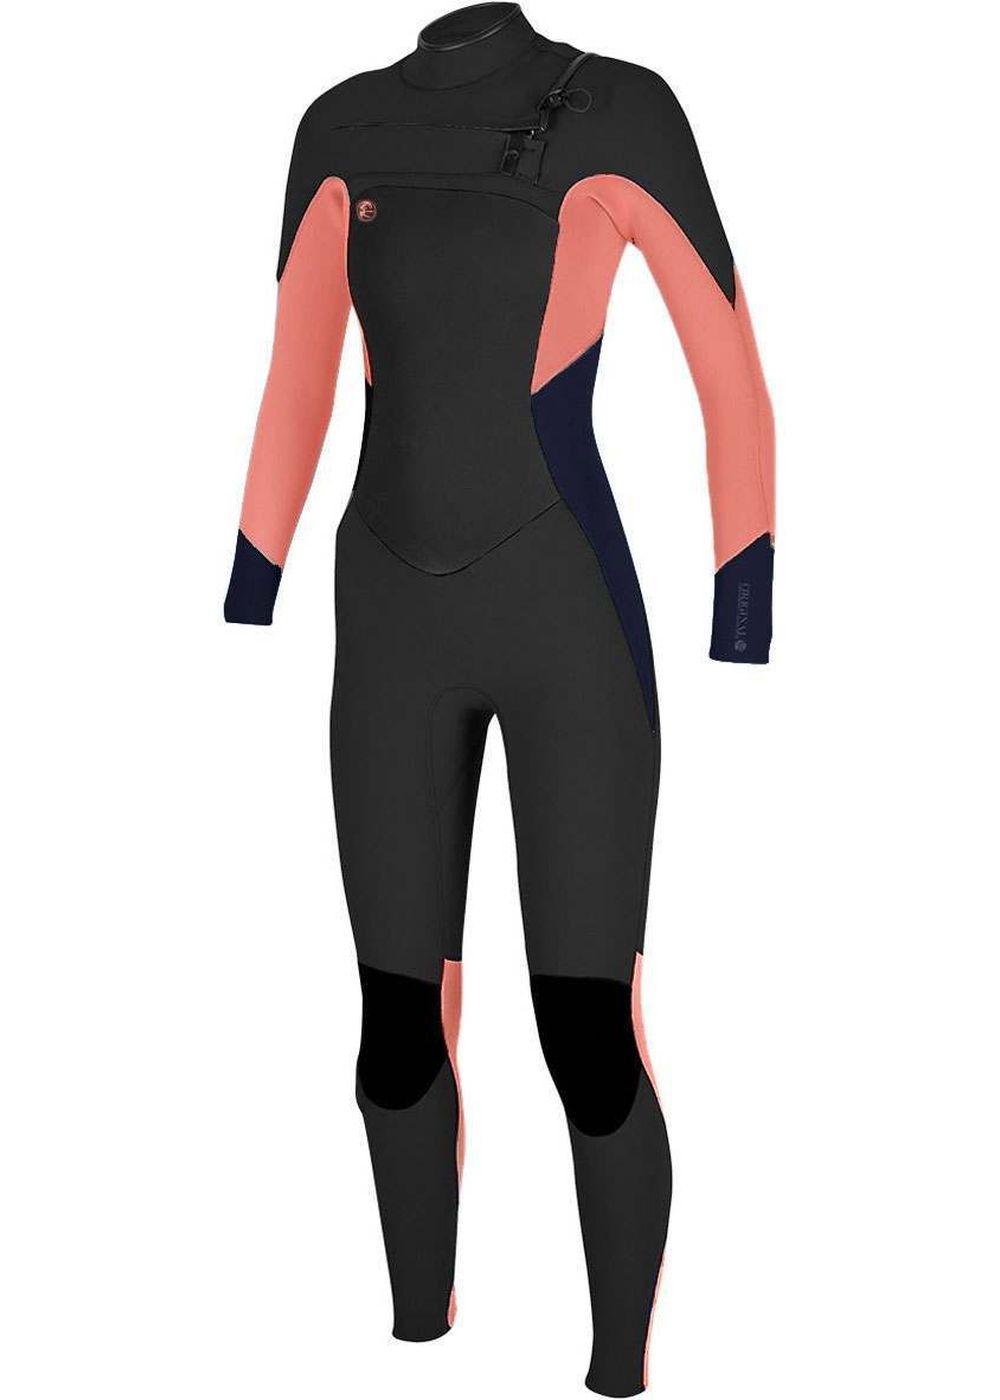 Oneill Womens Original Fz 4/3 Wetsuit 18 Blk/slt Picture